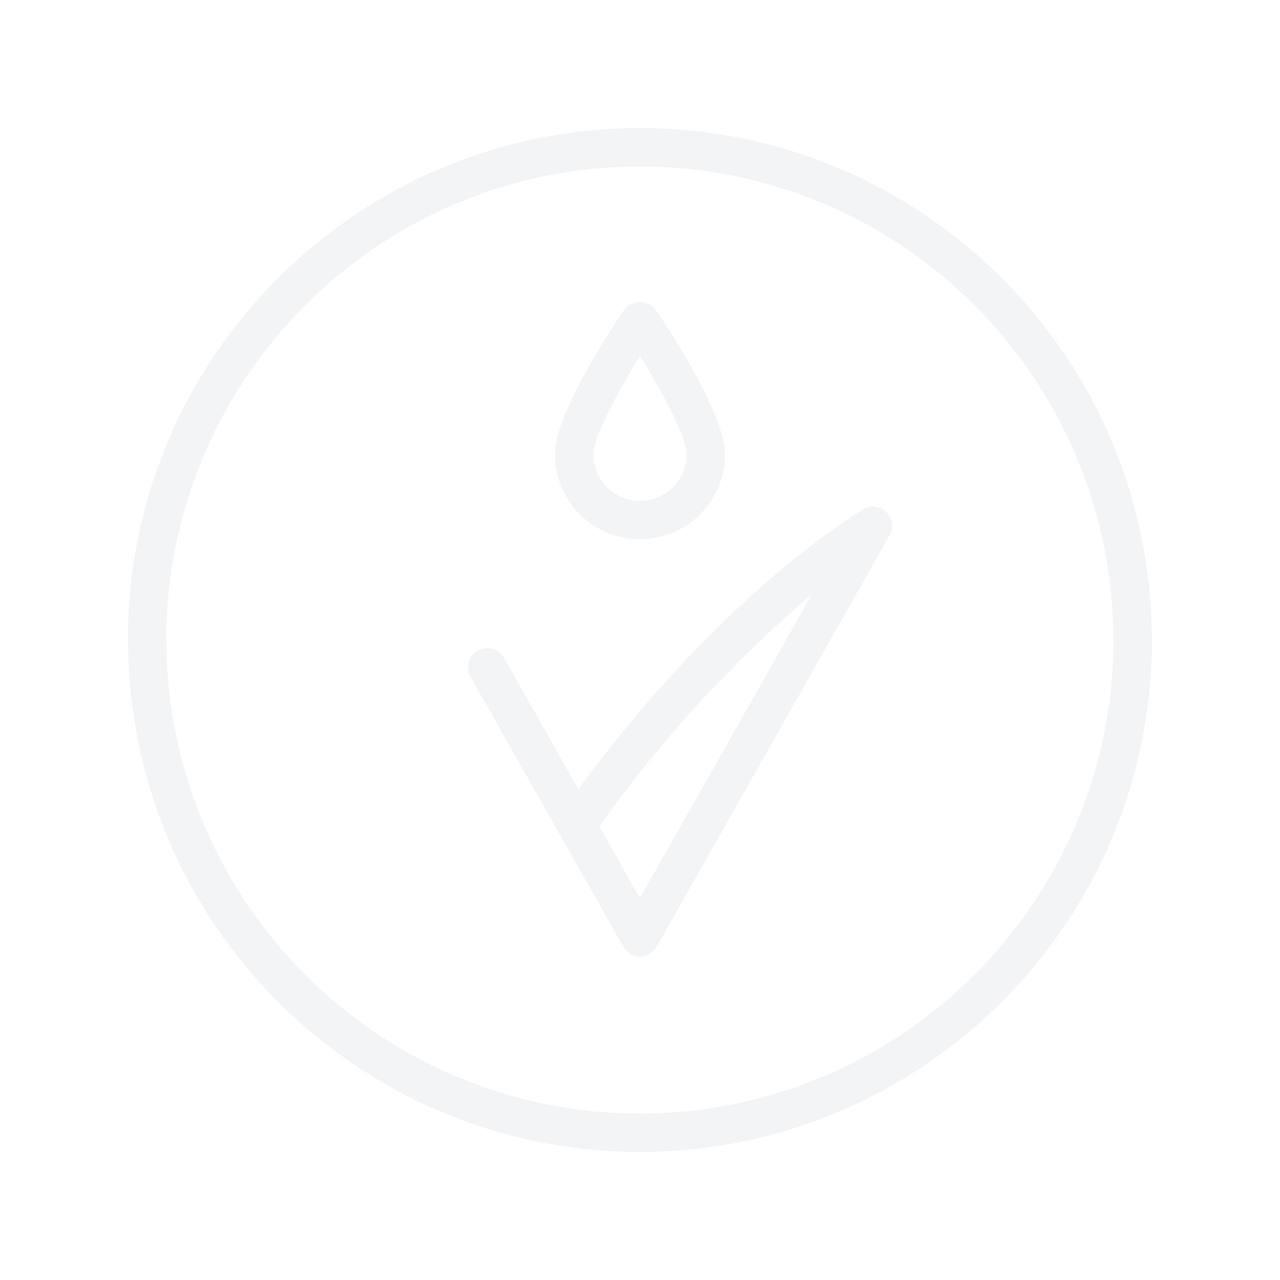 Clarins Multi-Active Night Revitalizing Cream (Normal/Combination Skin) 50ml